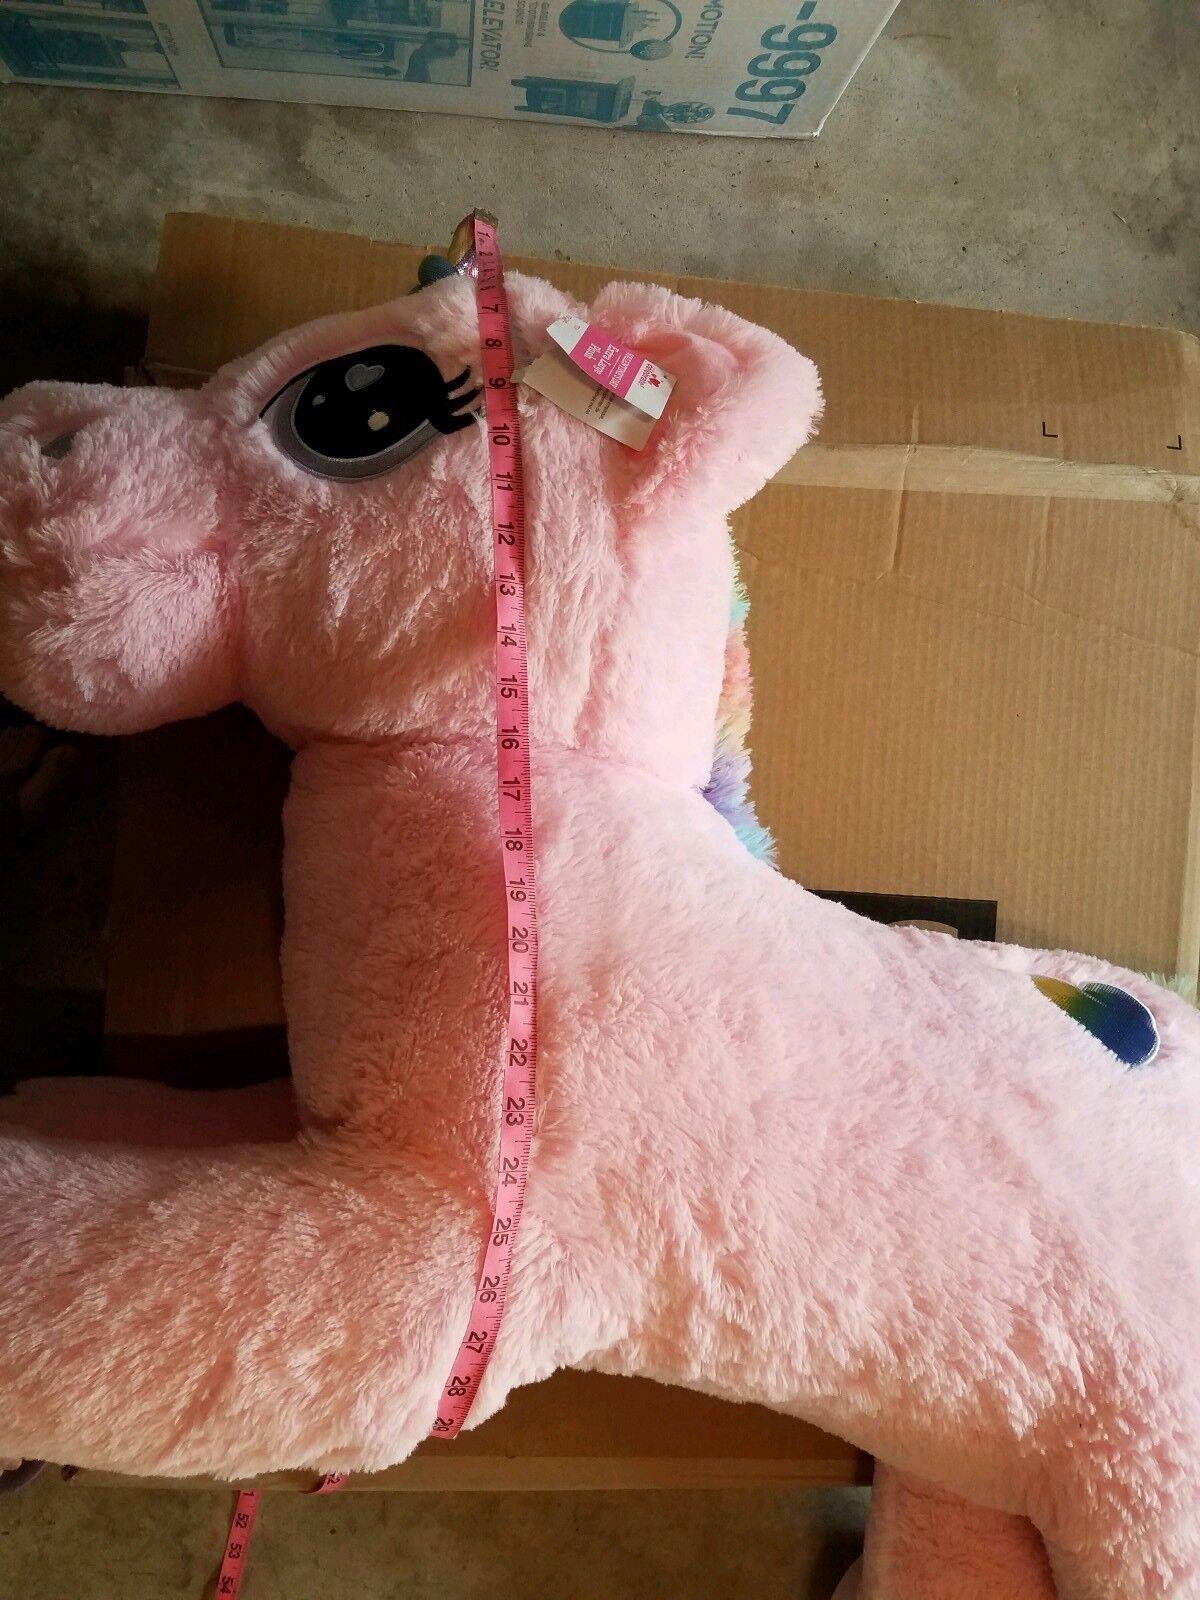 GIANT PINK UNICORN PLUSH GIFT Big Big Big Stuffed Animal Large Huge Valentines Day NWT 973364